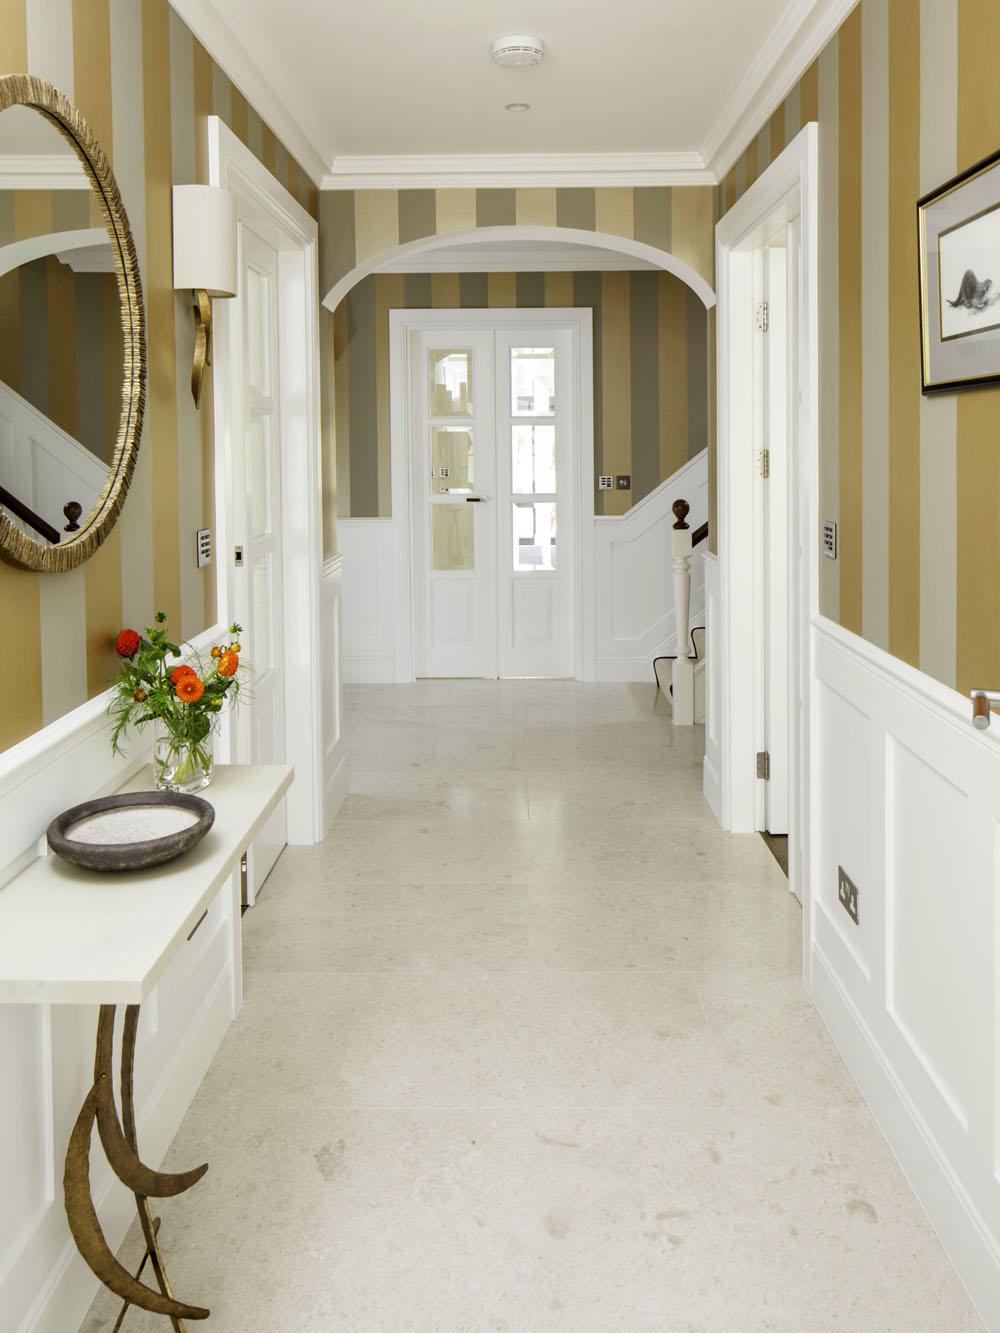 Residential interior design by Alicia Zimnickas